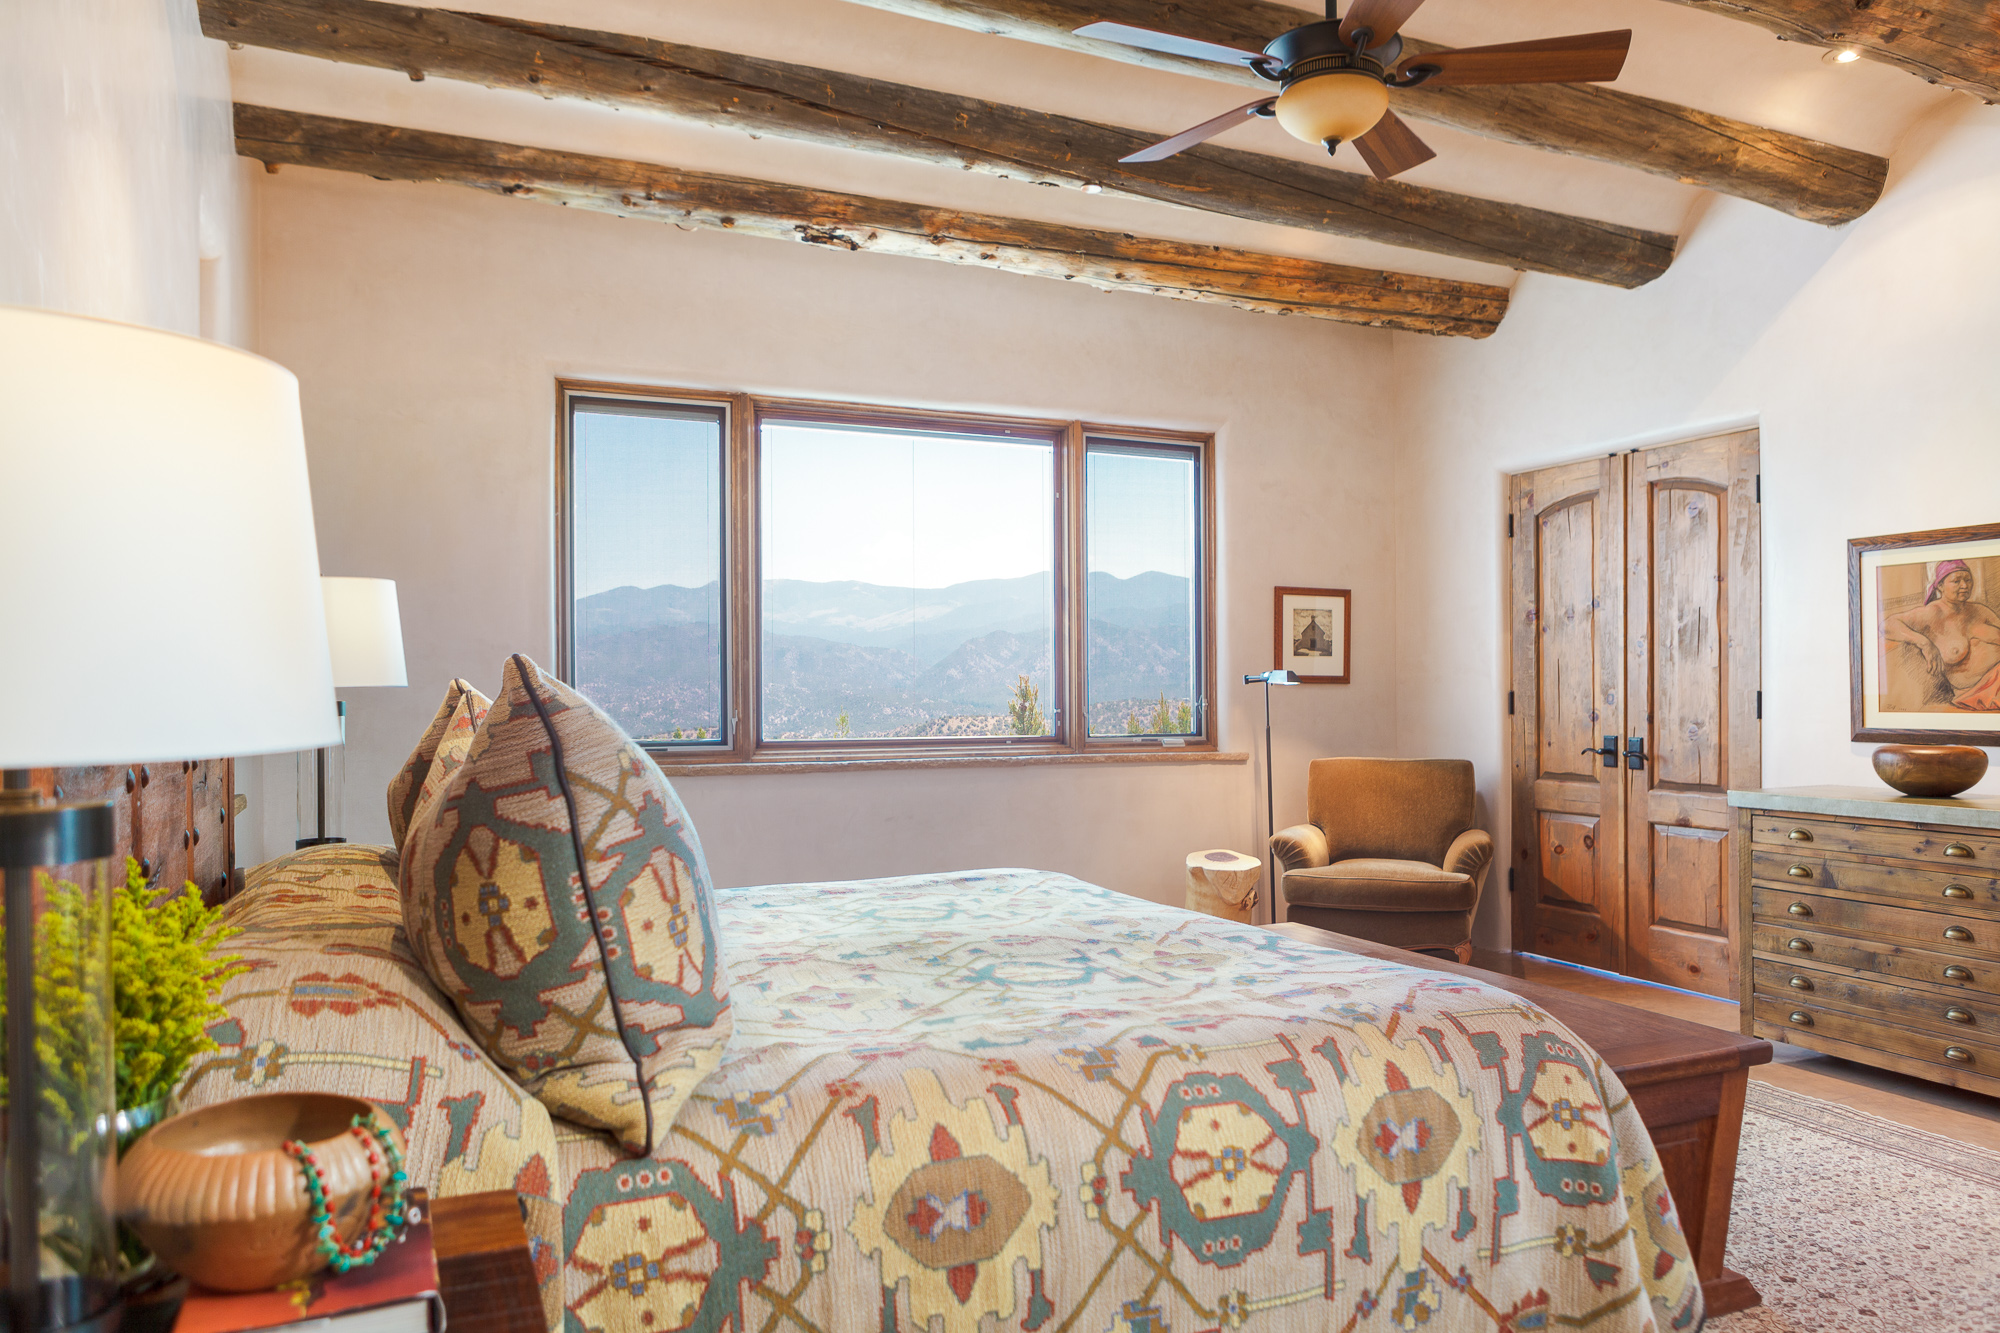 Modern Santa Fe Style Bedroom